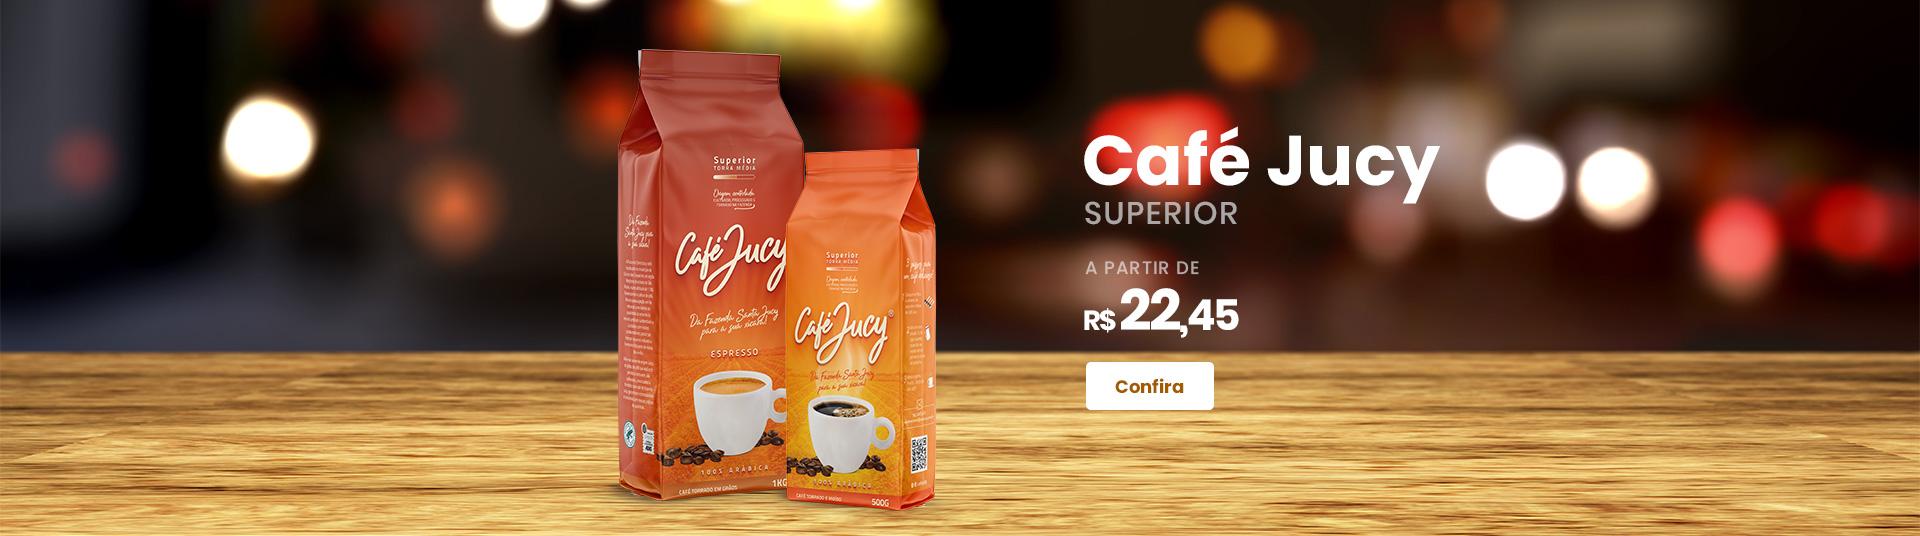 cafejucy